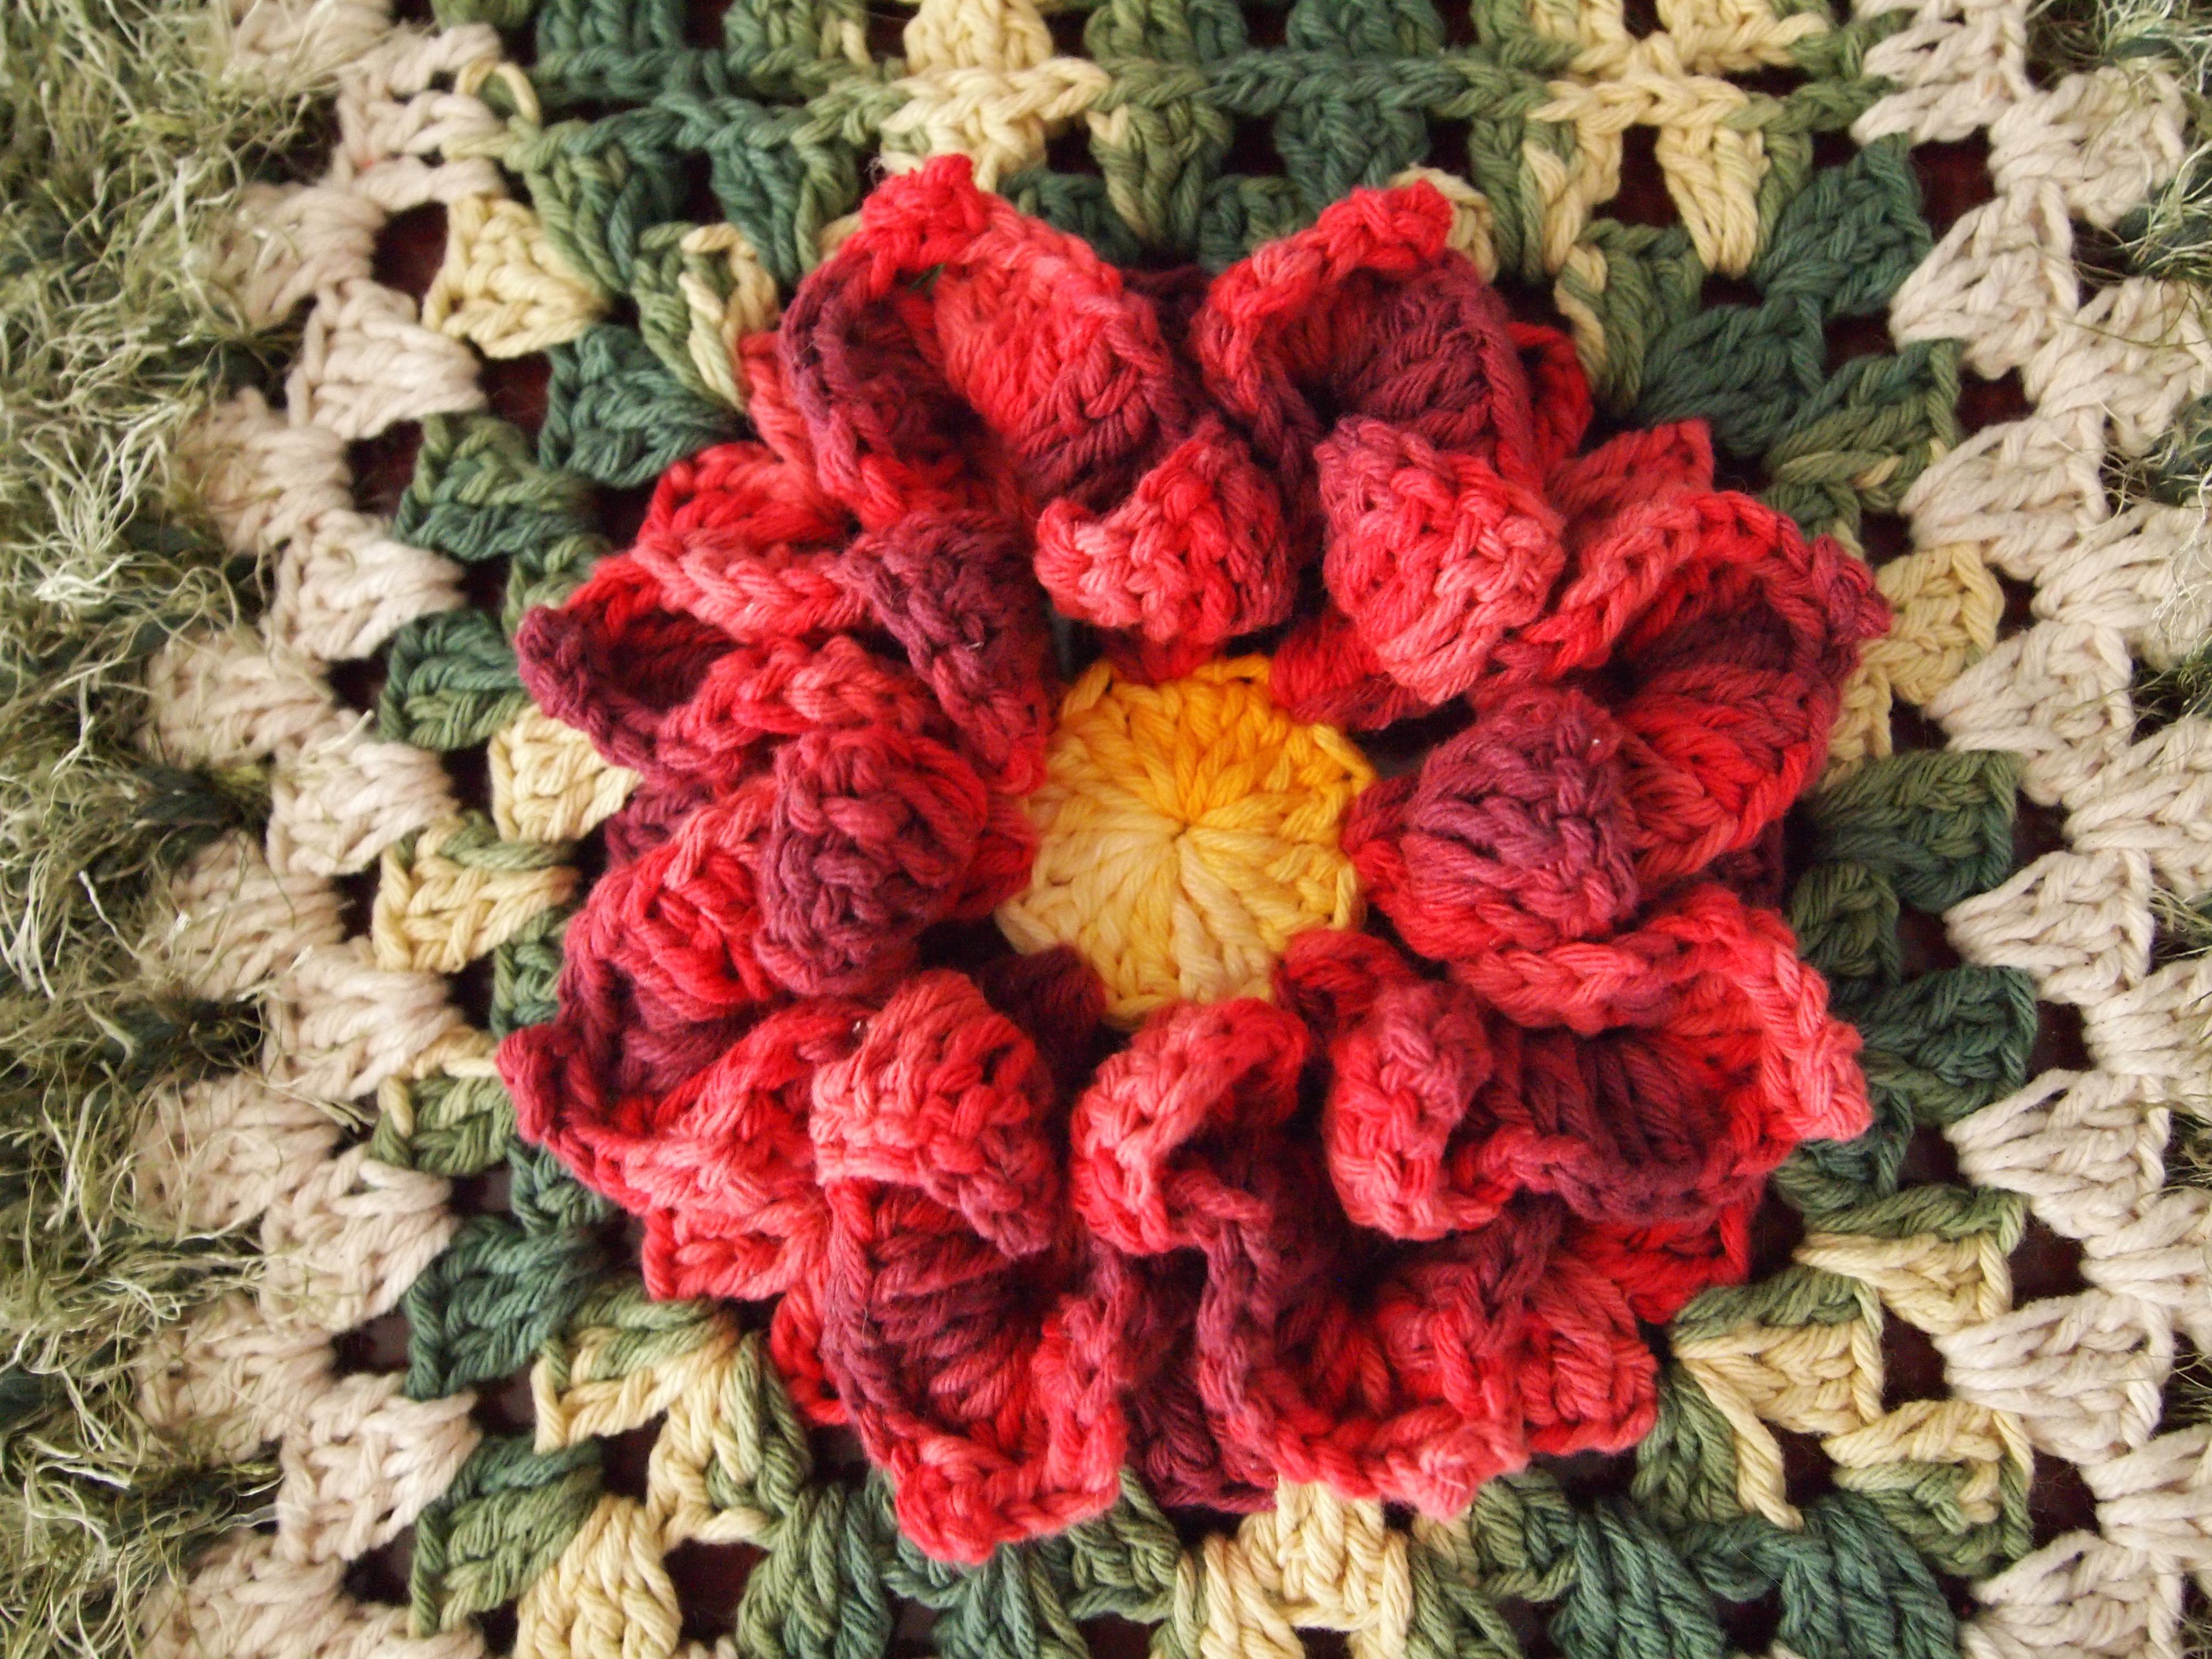 tapete redondo flor bico papagaio croches elsa elo car. Black Bedroom Furniture Sets. Home Design Ideas